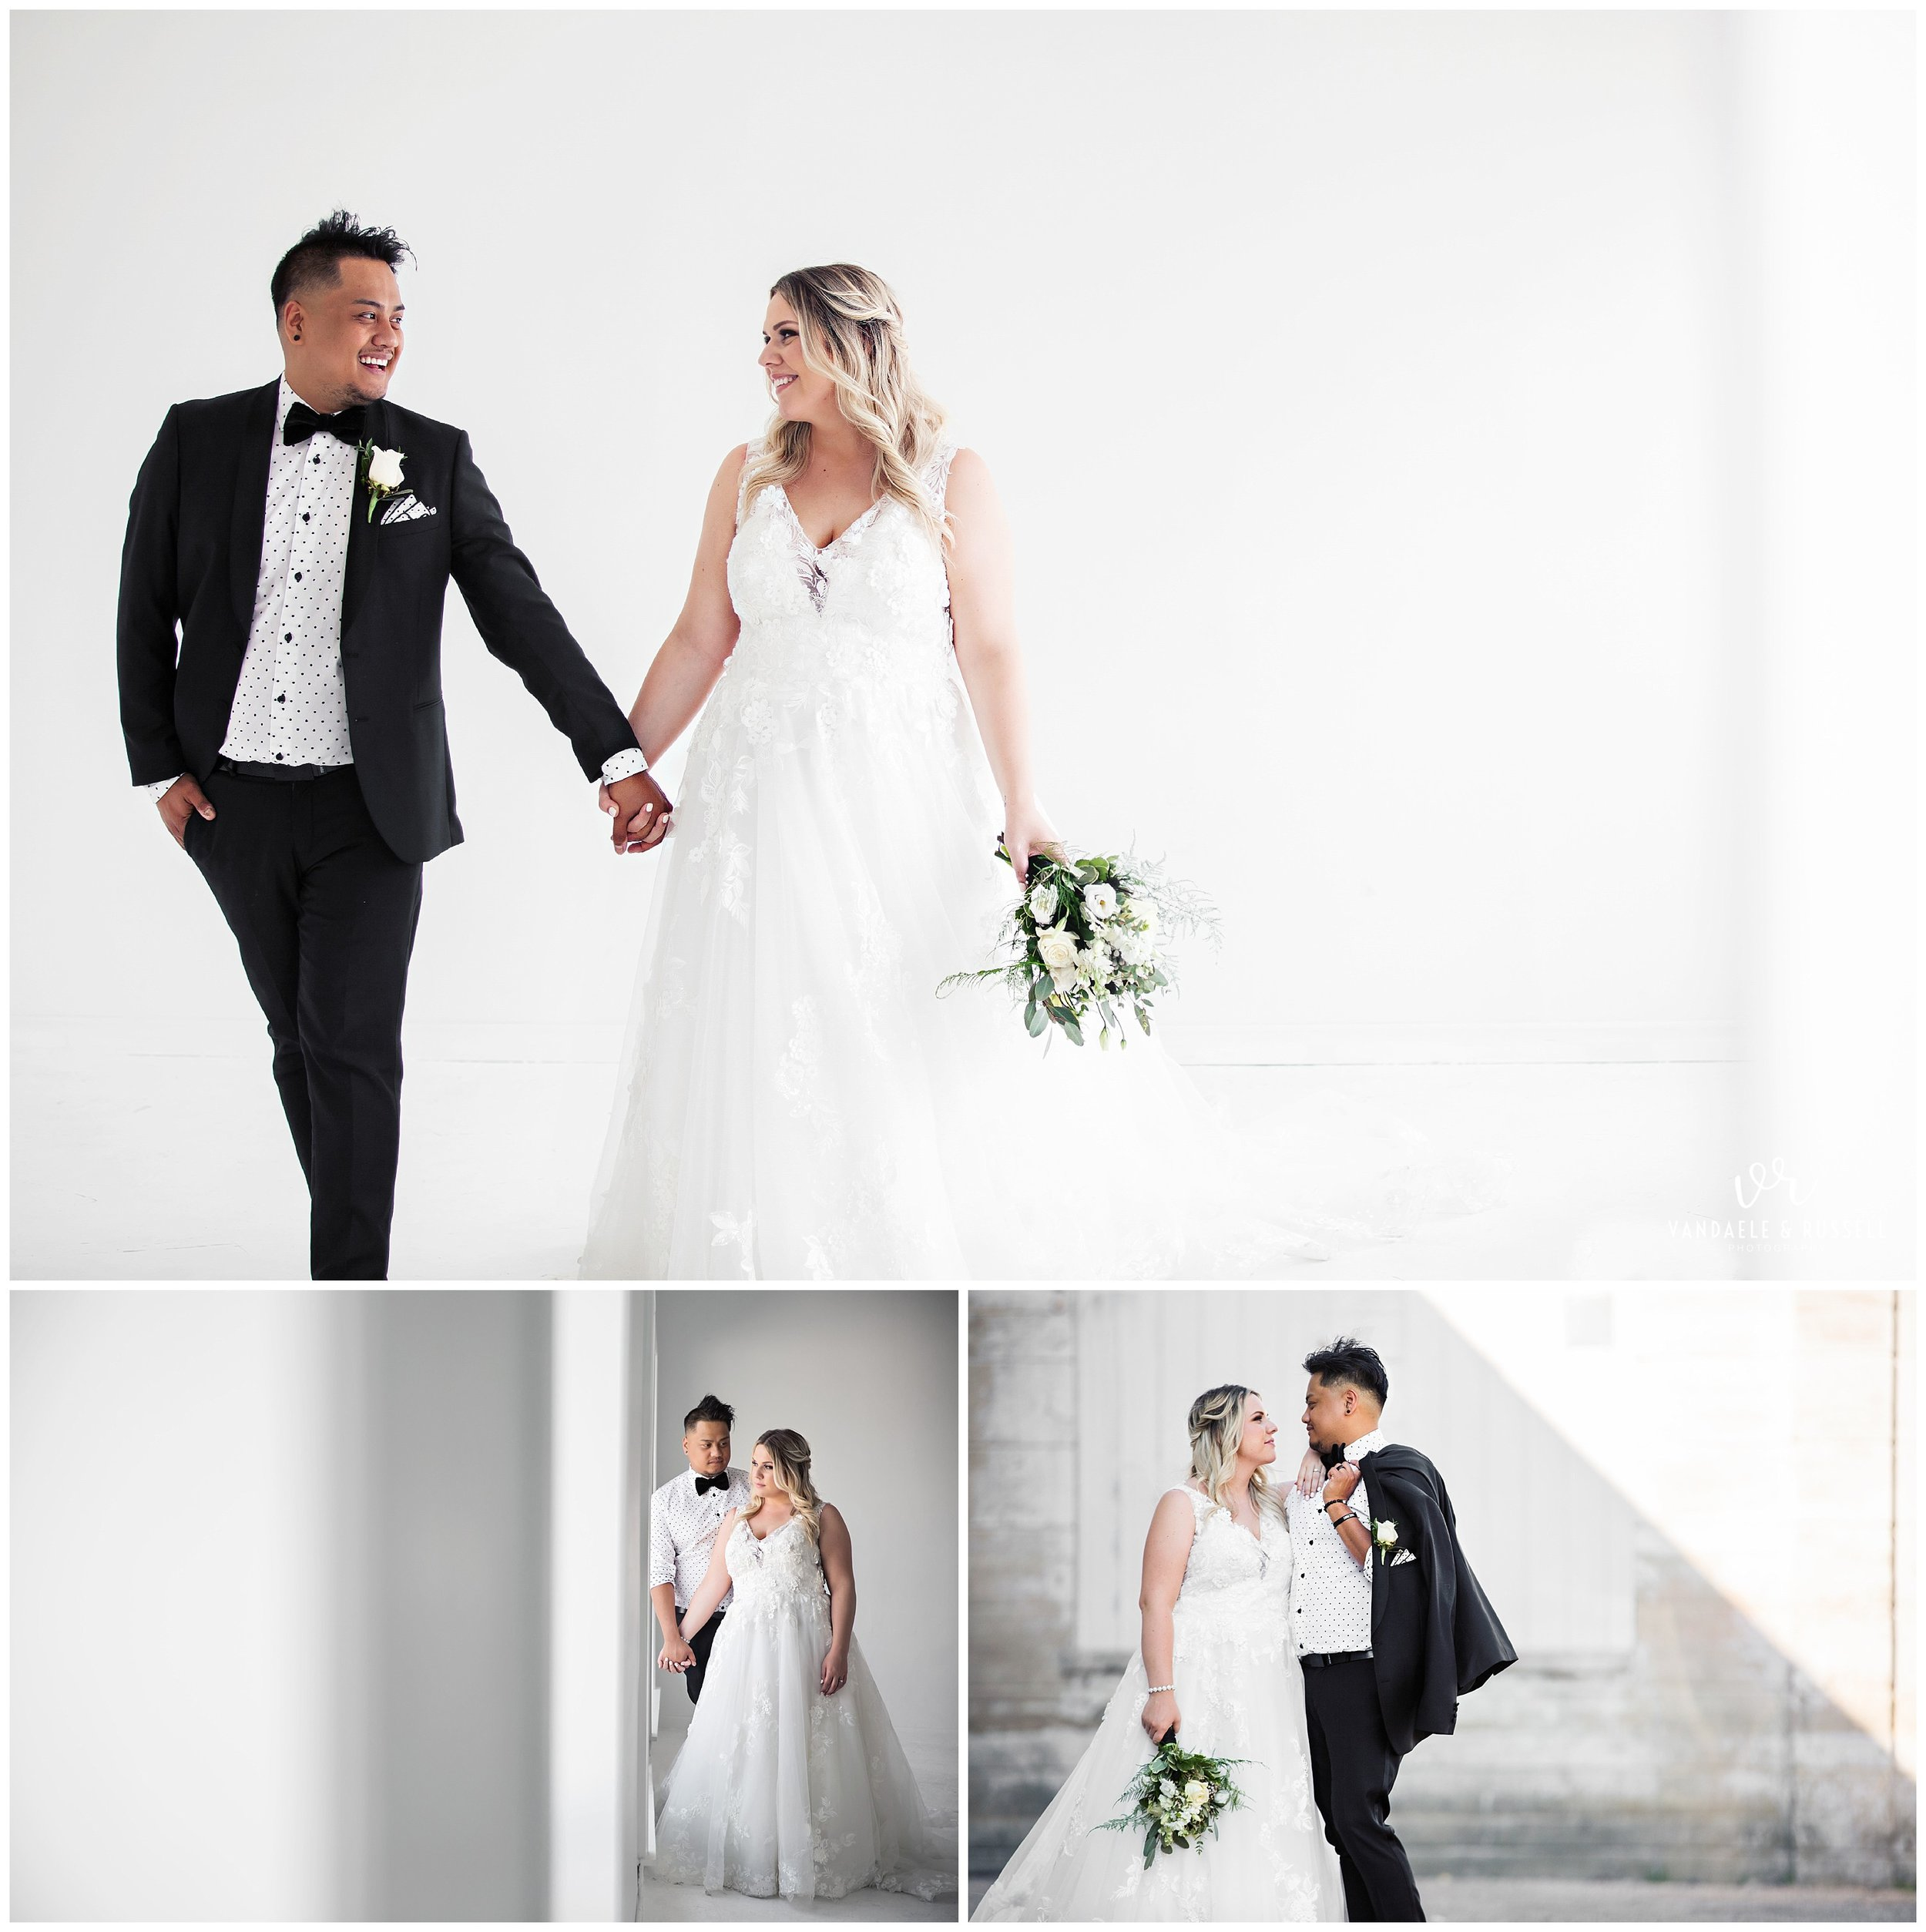 VanDaele-Russell-Wedding-Photography-London-Toronto-Ontario_0110.jpg